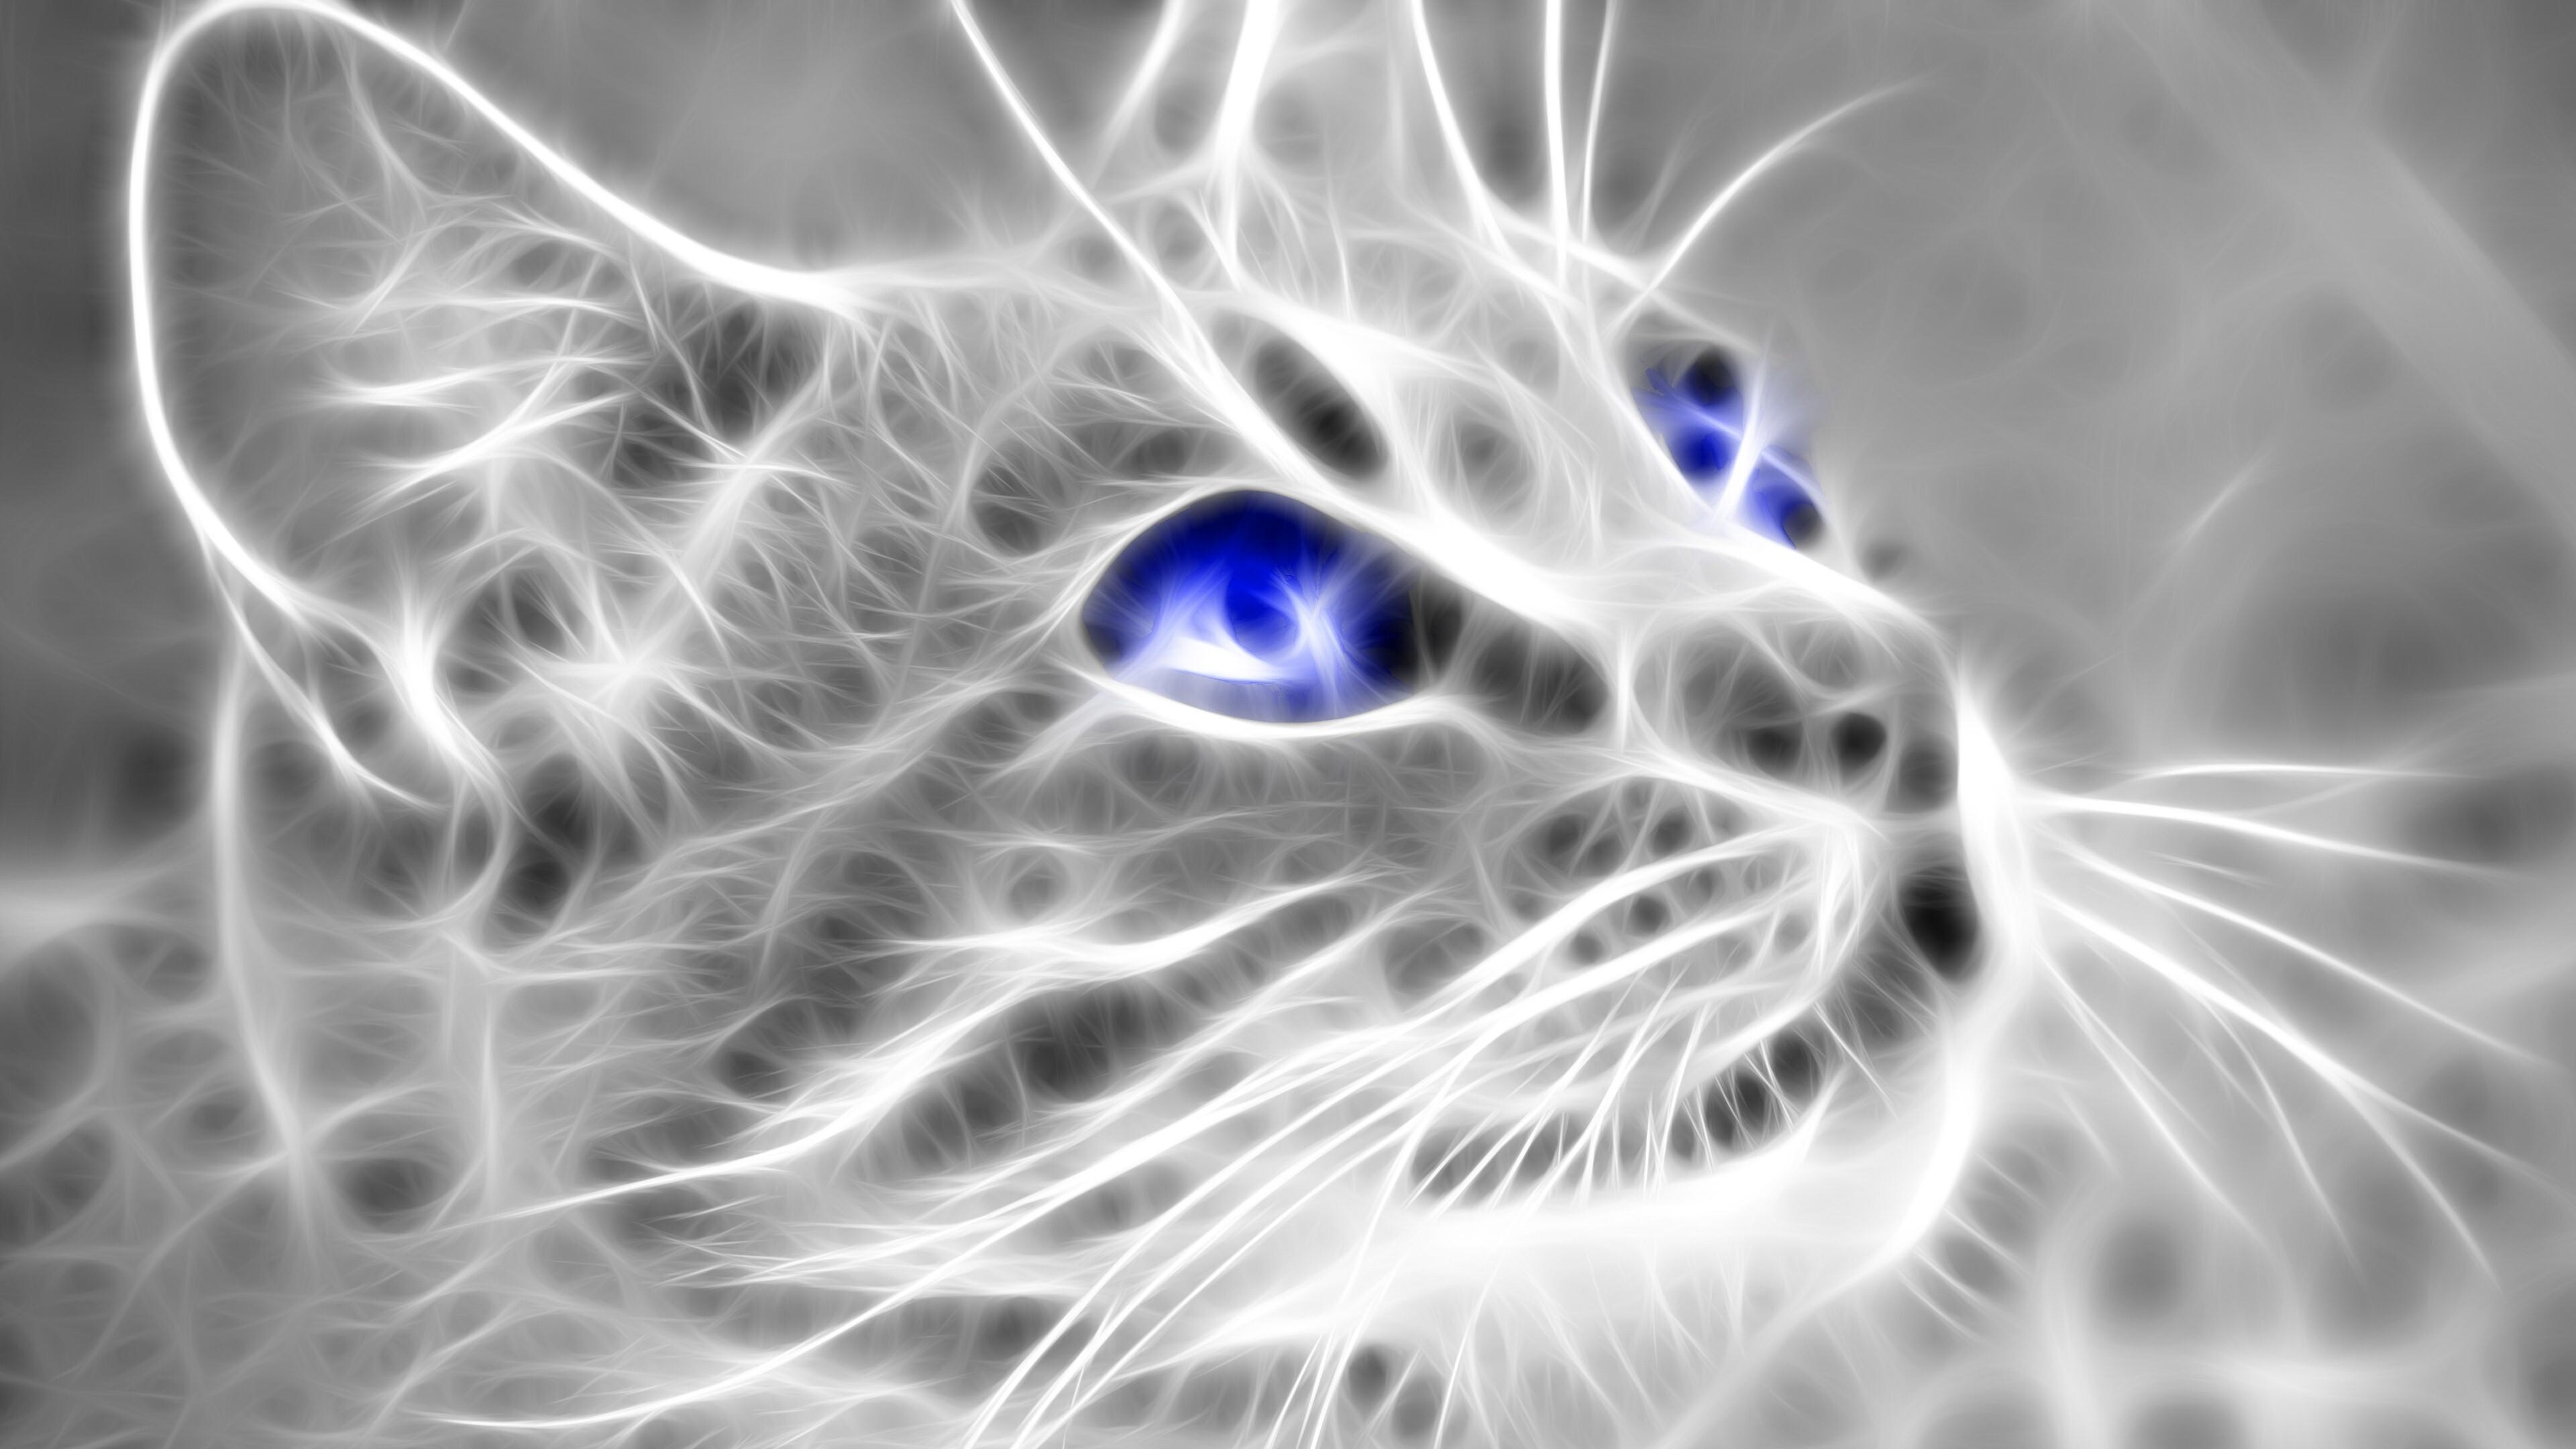 4K Wallpaper of 3D Cat   HD Wallpapers